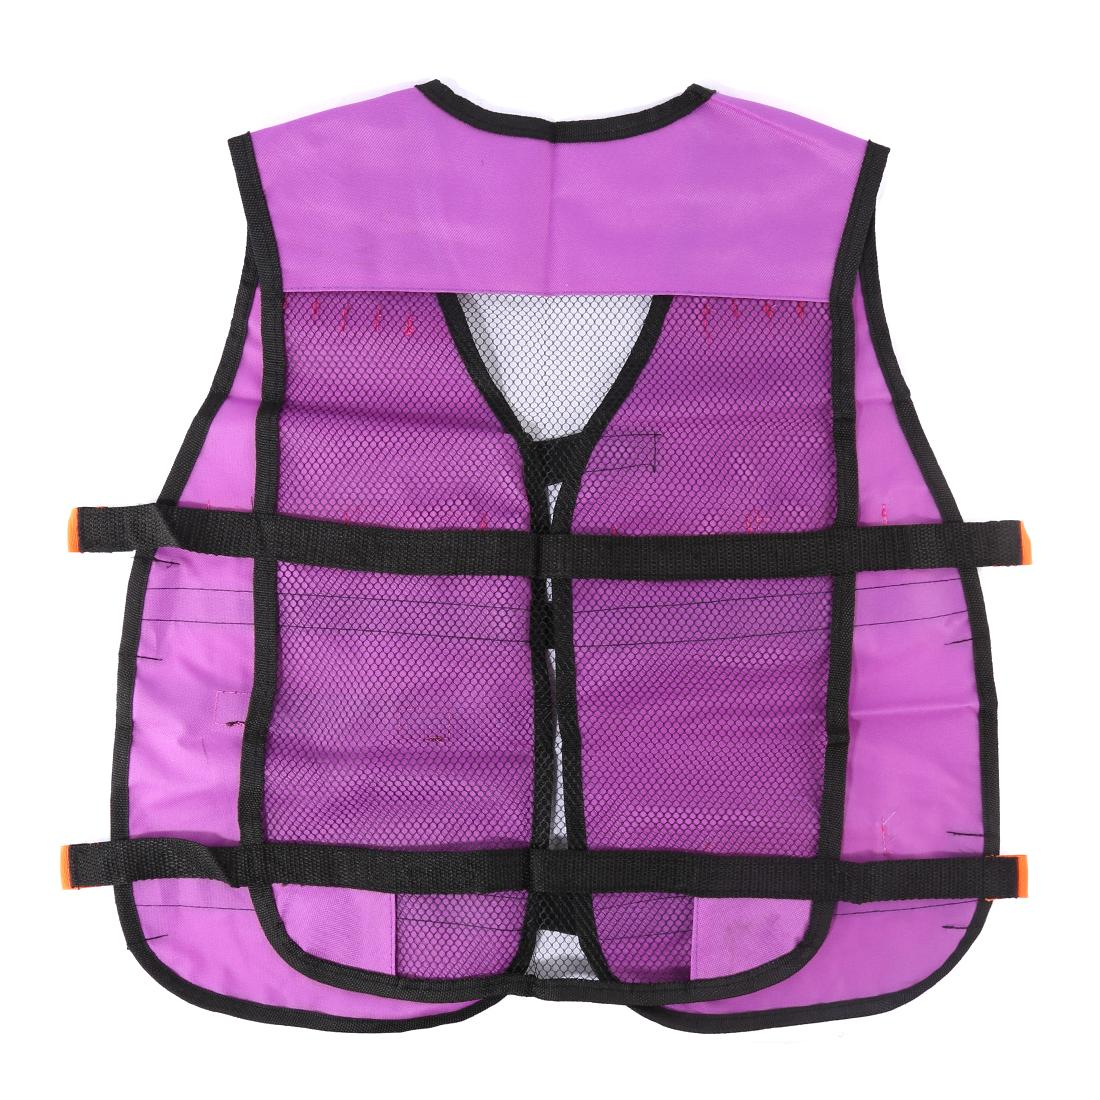 Women Gift Soft Tactical Darts Waistcoat for <font><b>Nerf</b></font> Defense for CS Games Equipment- Purple